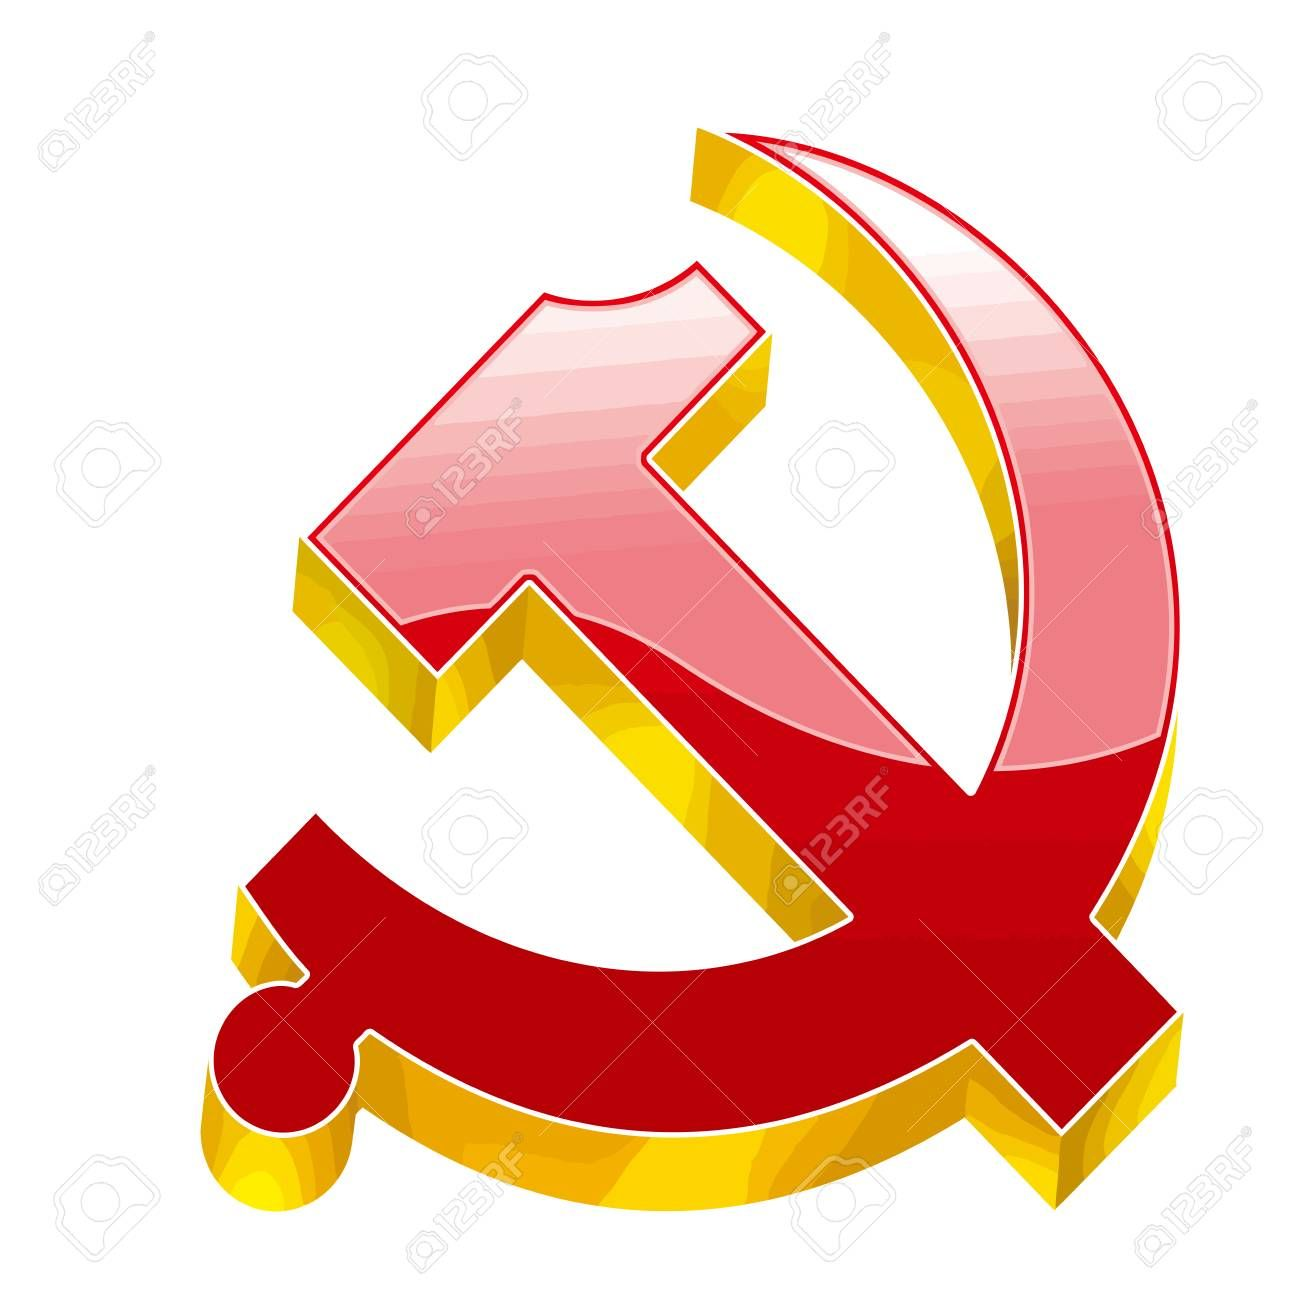 Communism Socialism Union Soviet Revolution Red Yellow Illustration Affiliate Union Soviet Communism Socialism Yellow Art Design Illustration Art